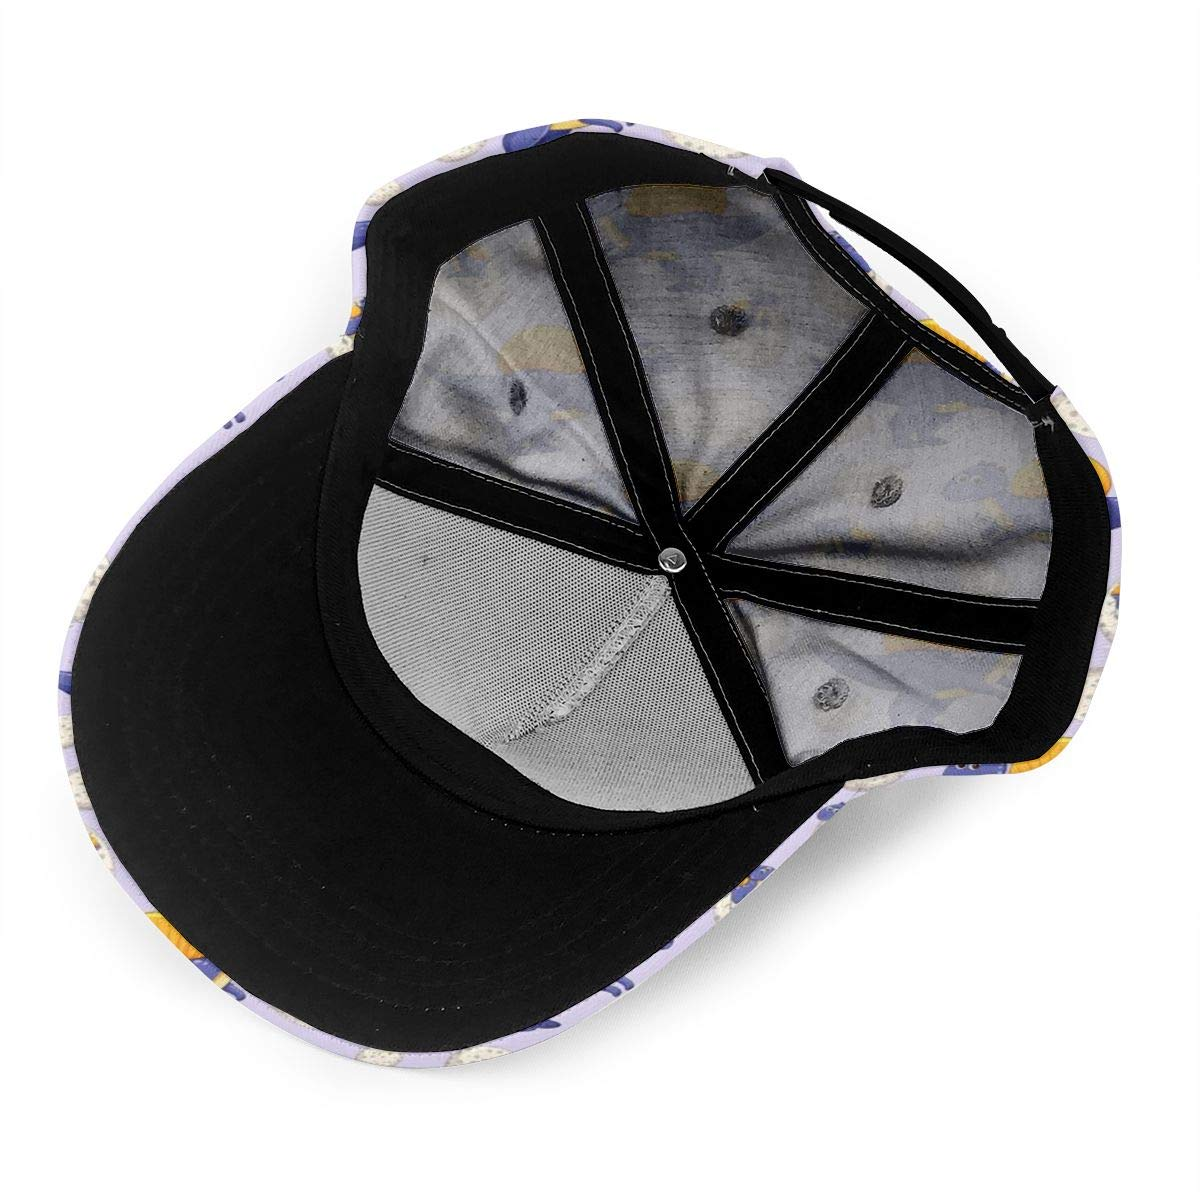 HHTZTCL Dinosaur Eggs Baseball Cap Adjustable Washed Cotton Dad Hat Hats Black